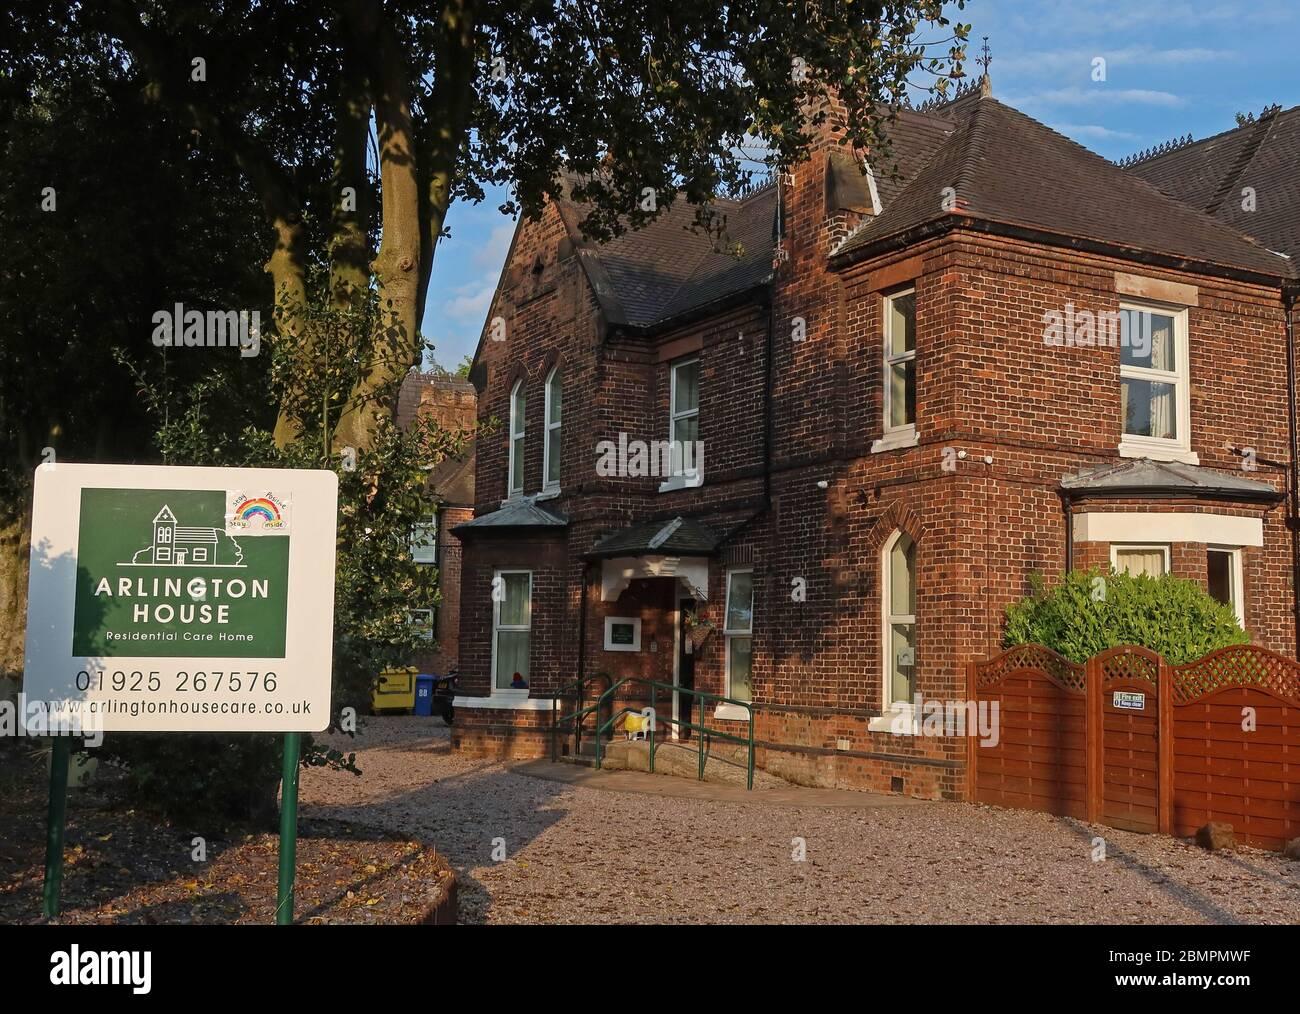 Arlington Lodge Care Home, Arlington House Residential Care Home,Ackers lane,Warrington, Cheshire, England, UK Stock Photo